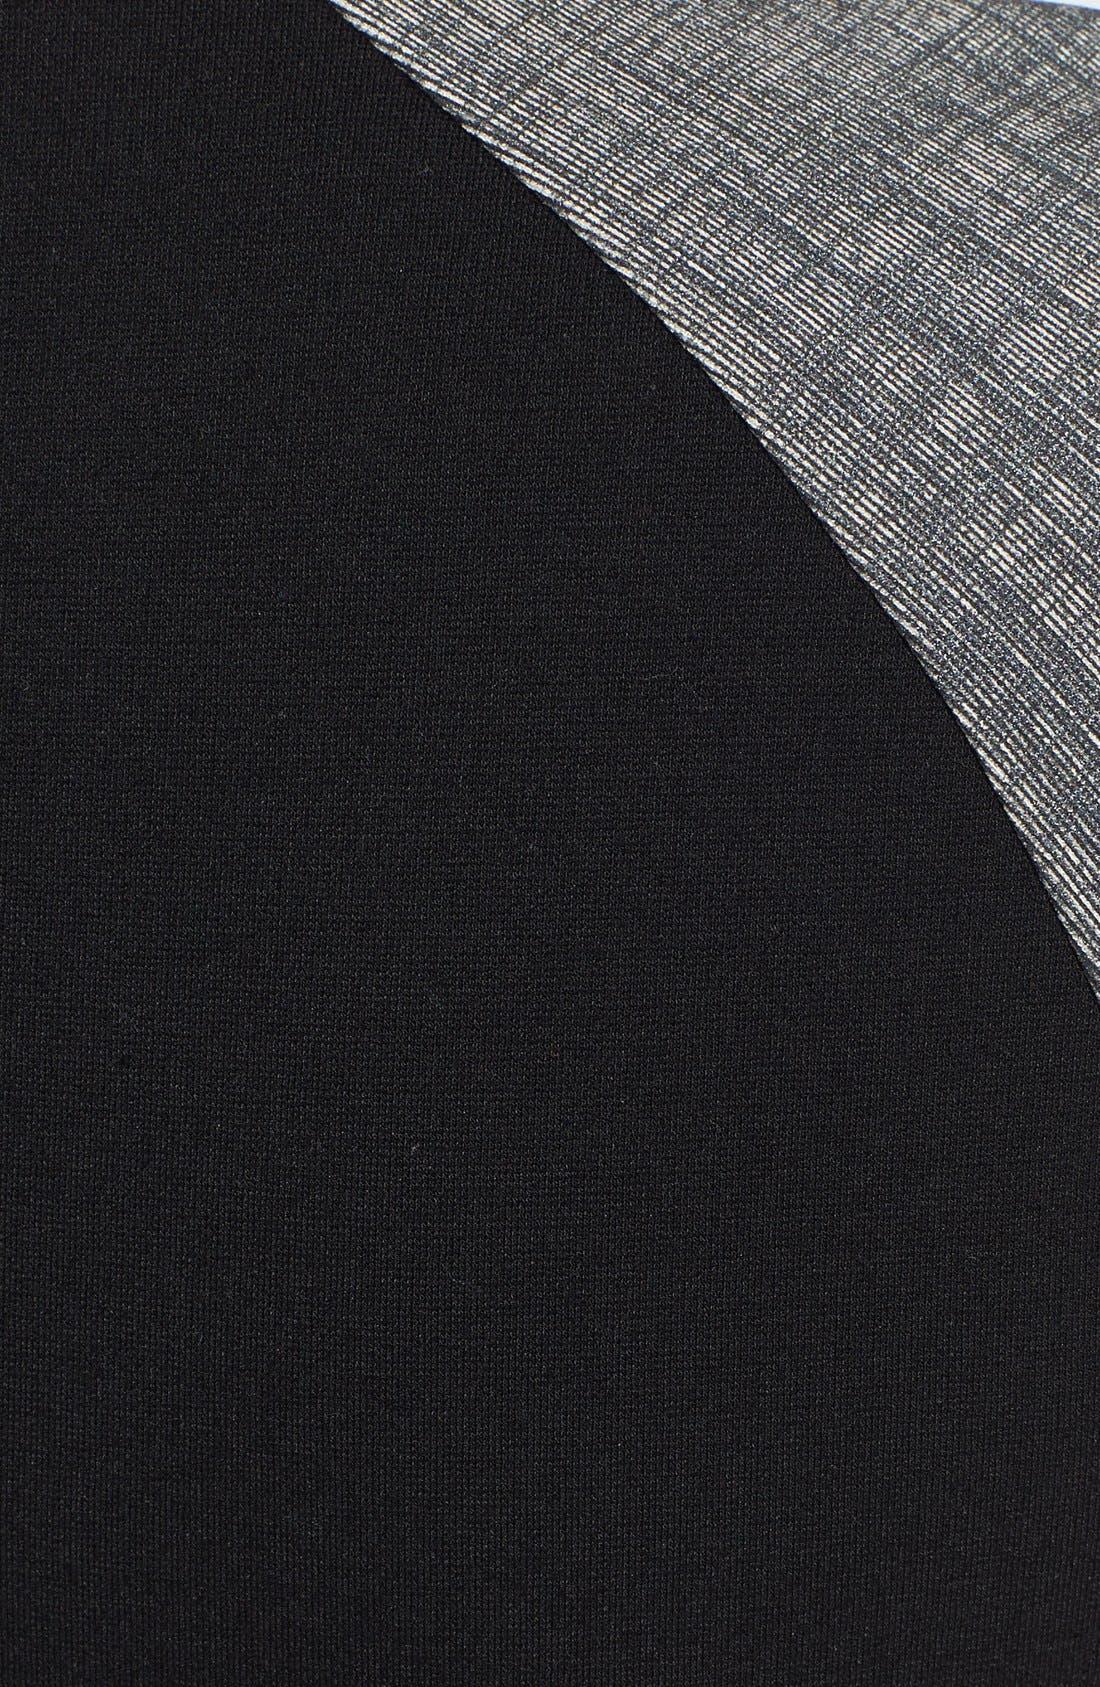 Croc Embossed Panel Punto Milano Sheath Dress,                             Alternate thumbnail 3, color,